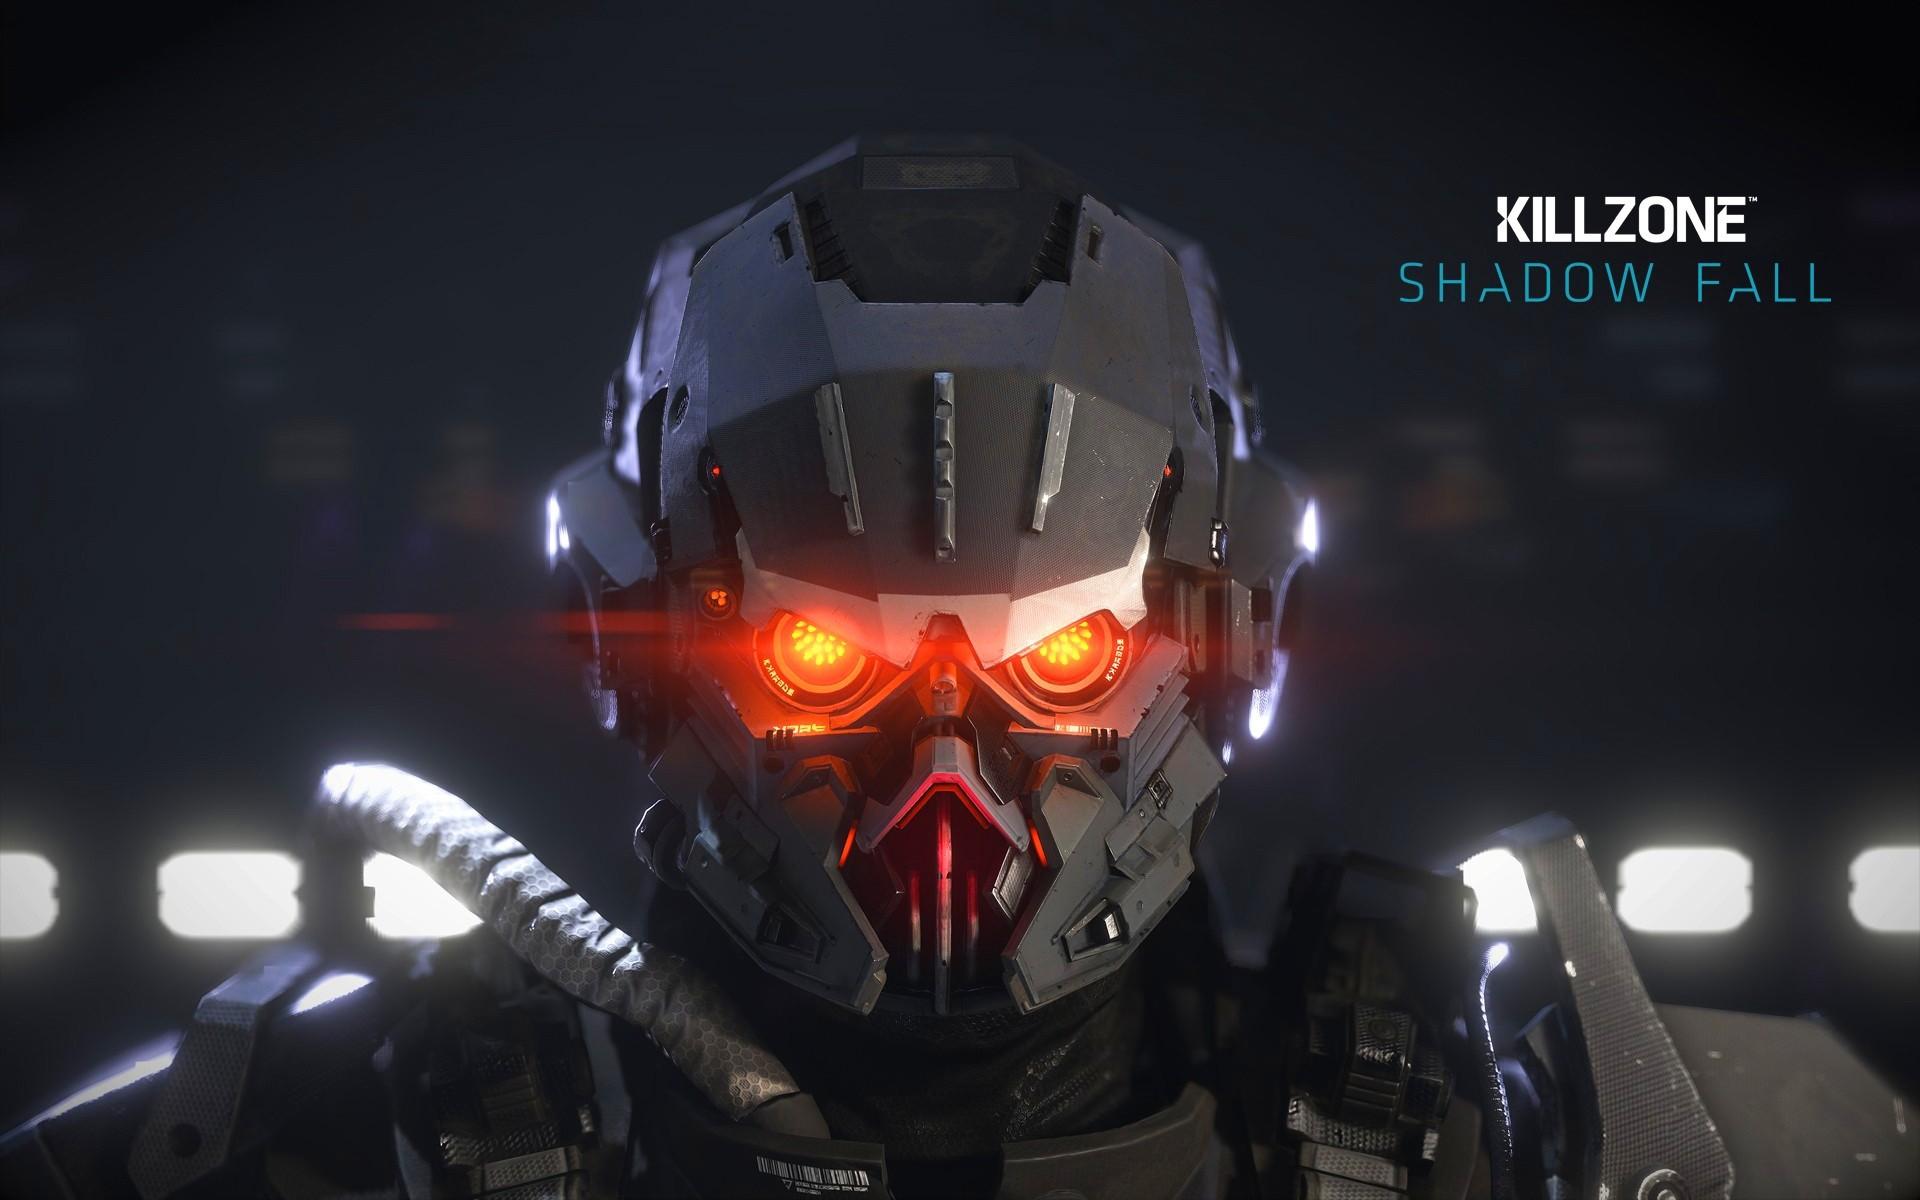 General 1920x1200 Killzone Killzone: Shadow Fall video games glowing eyes video game art science fiction